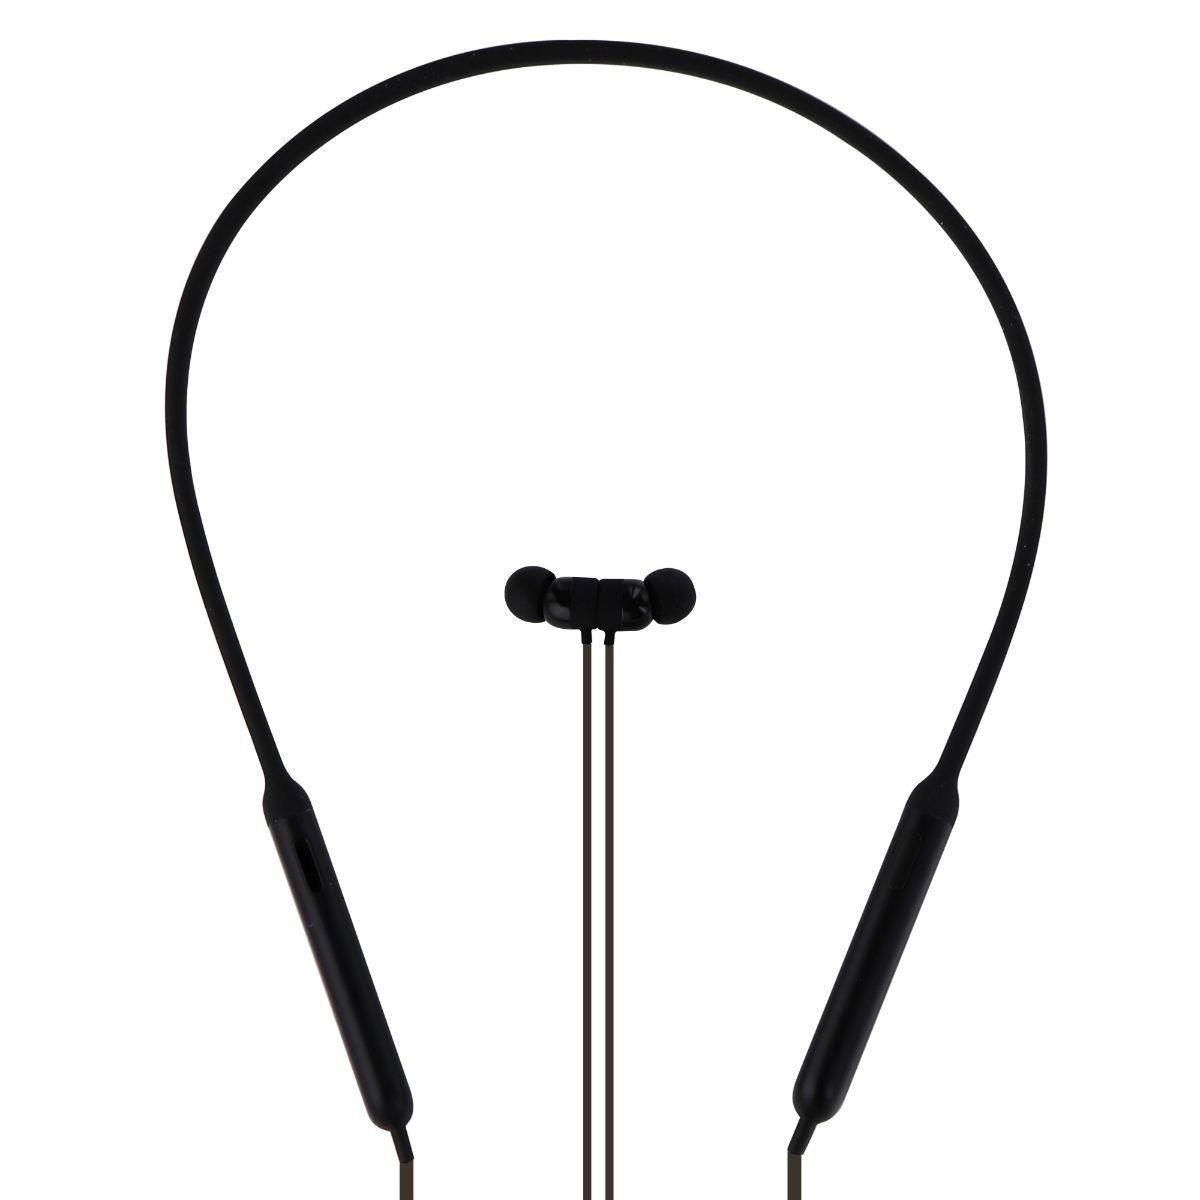 Beats BeatsX Series Wireless In-Ear Neckband Headphones - Black (MTH52LL/A)